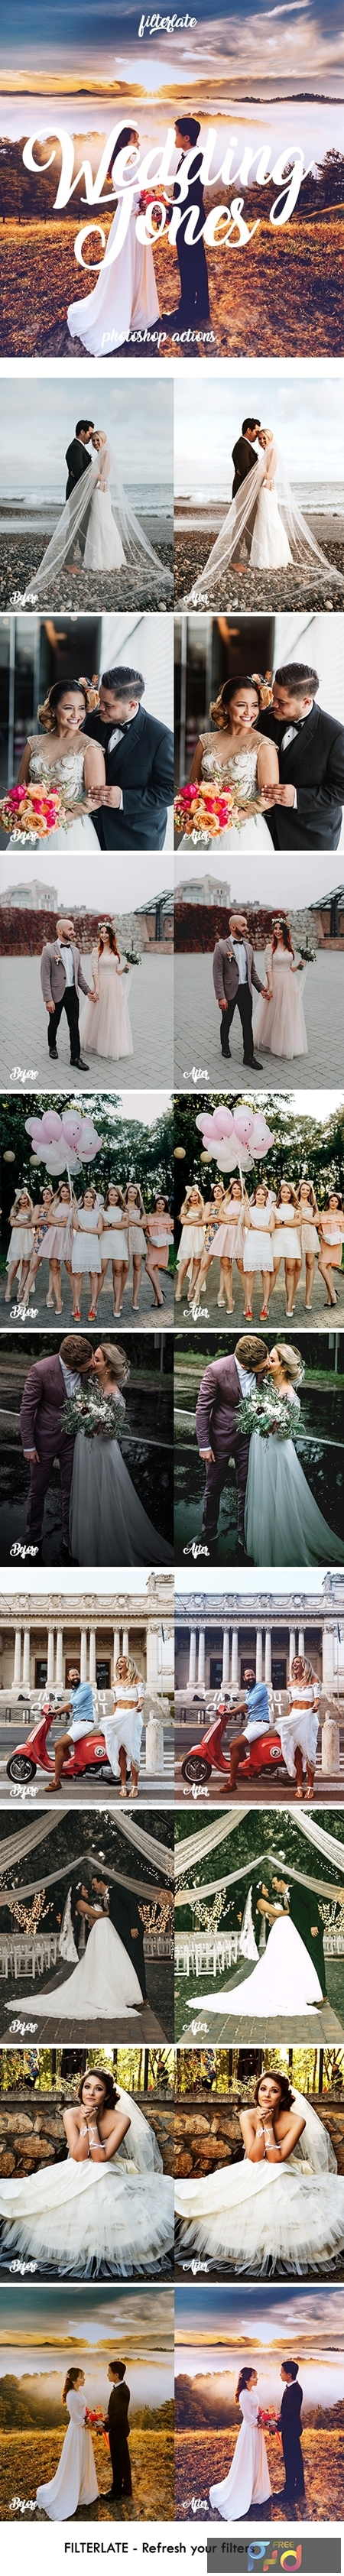 Wedding Tones 24321948 1